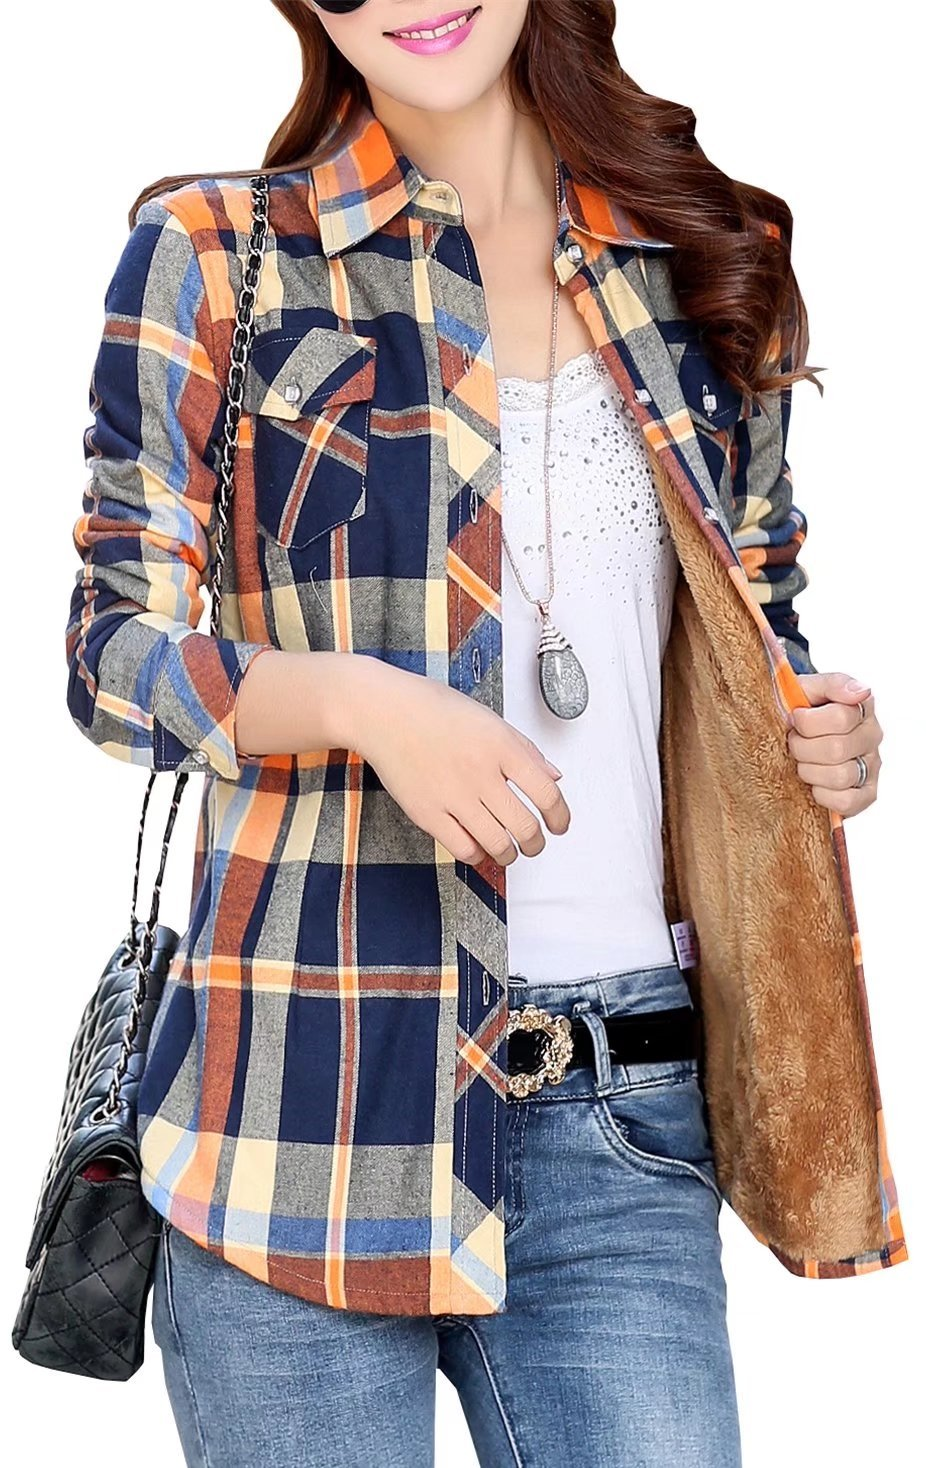 EMAOR Women's Fleece Lined Plaid Flannel Warm Shirt Button Up Blouse Tops